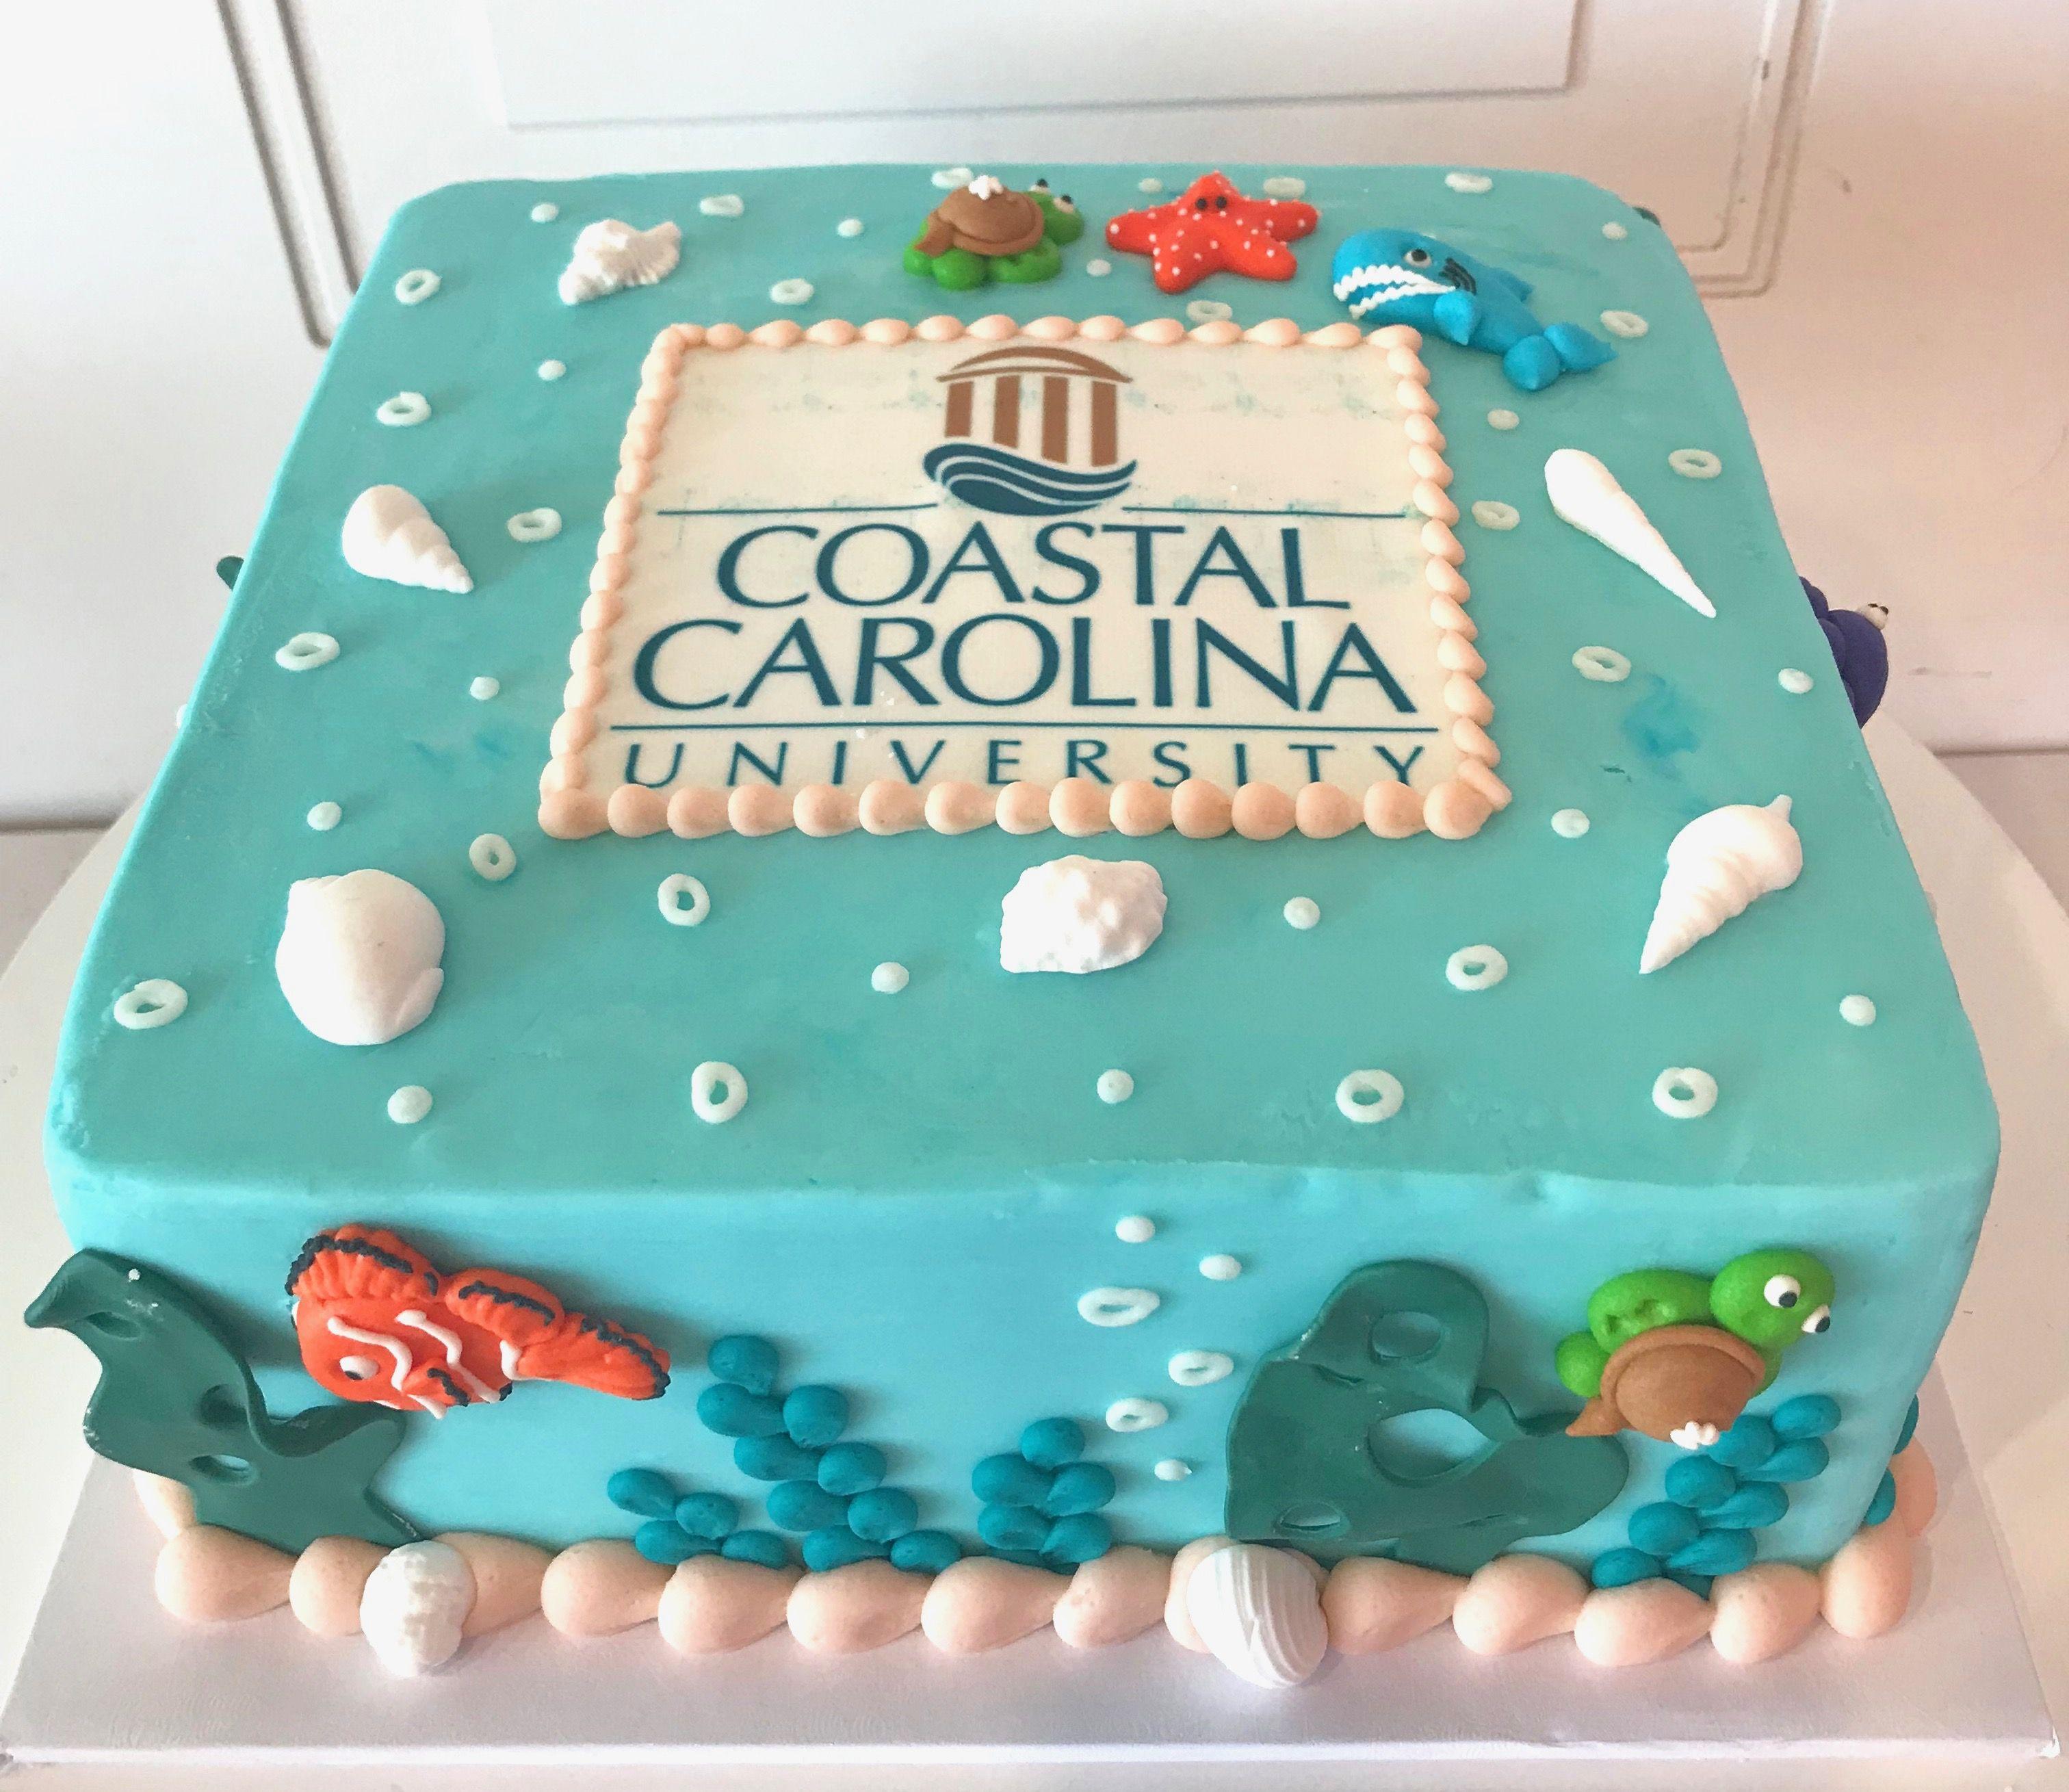 Graduation Cakes In Cincinnati 3 Sweet Girls Cakery Kenwood Otr Graduation Cakes Graduation Desserts Graduation Cake Pops